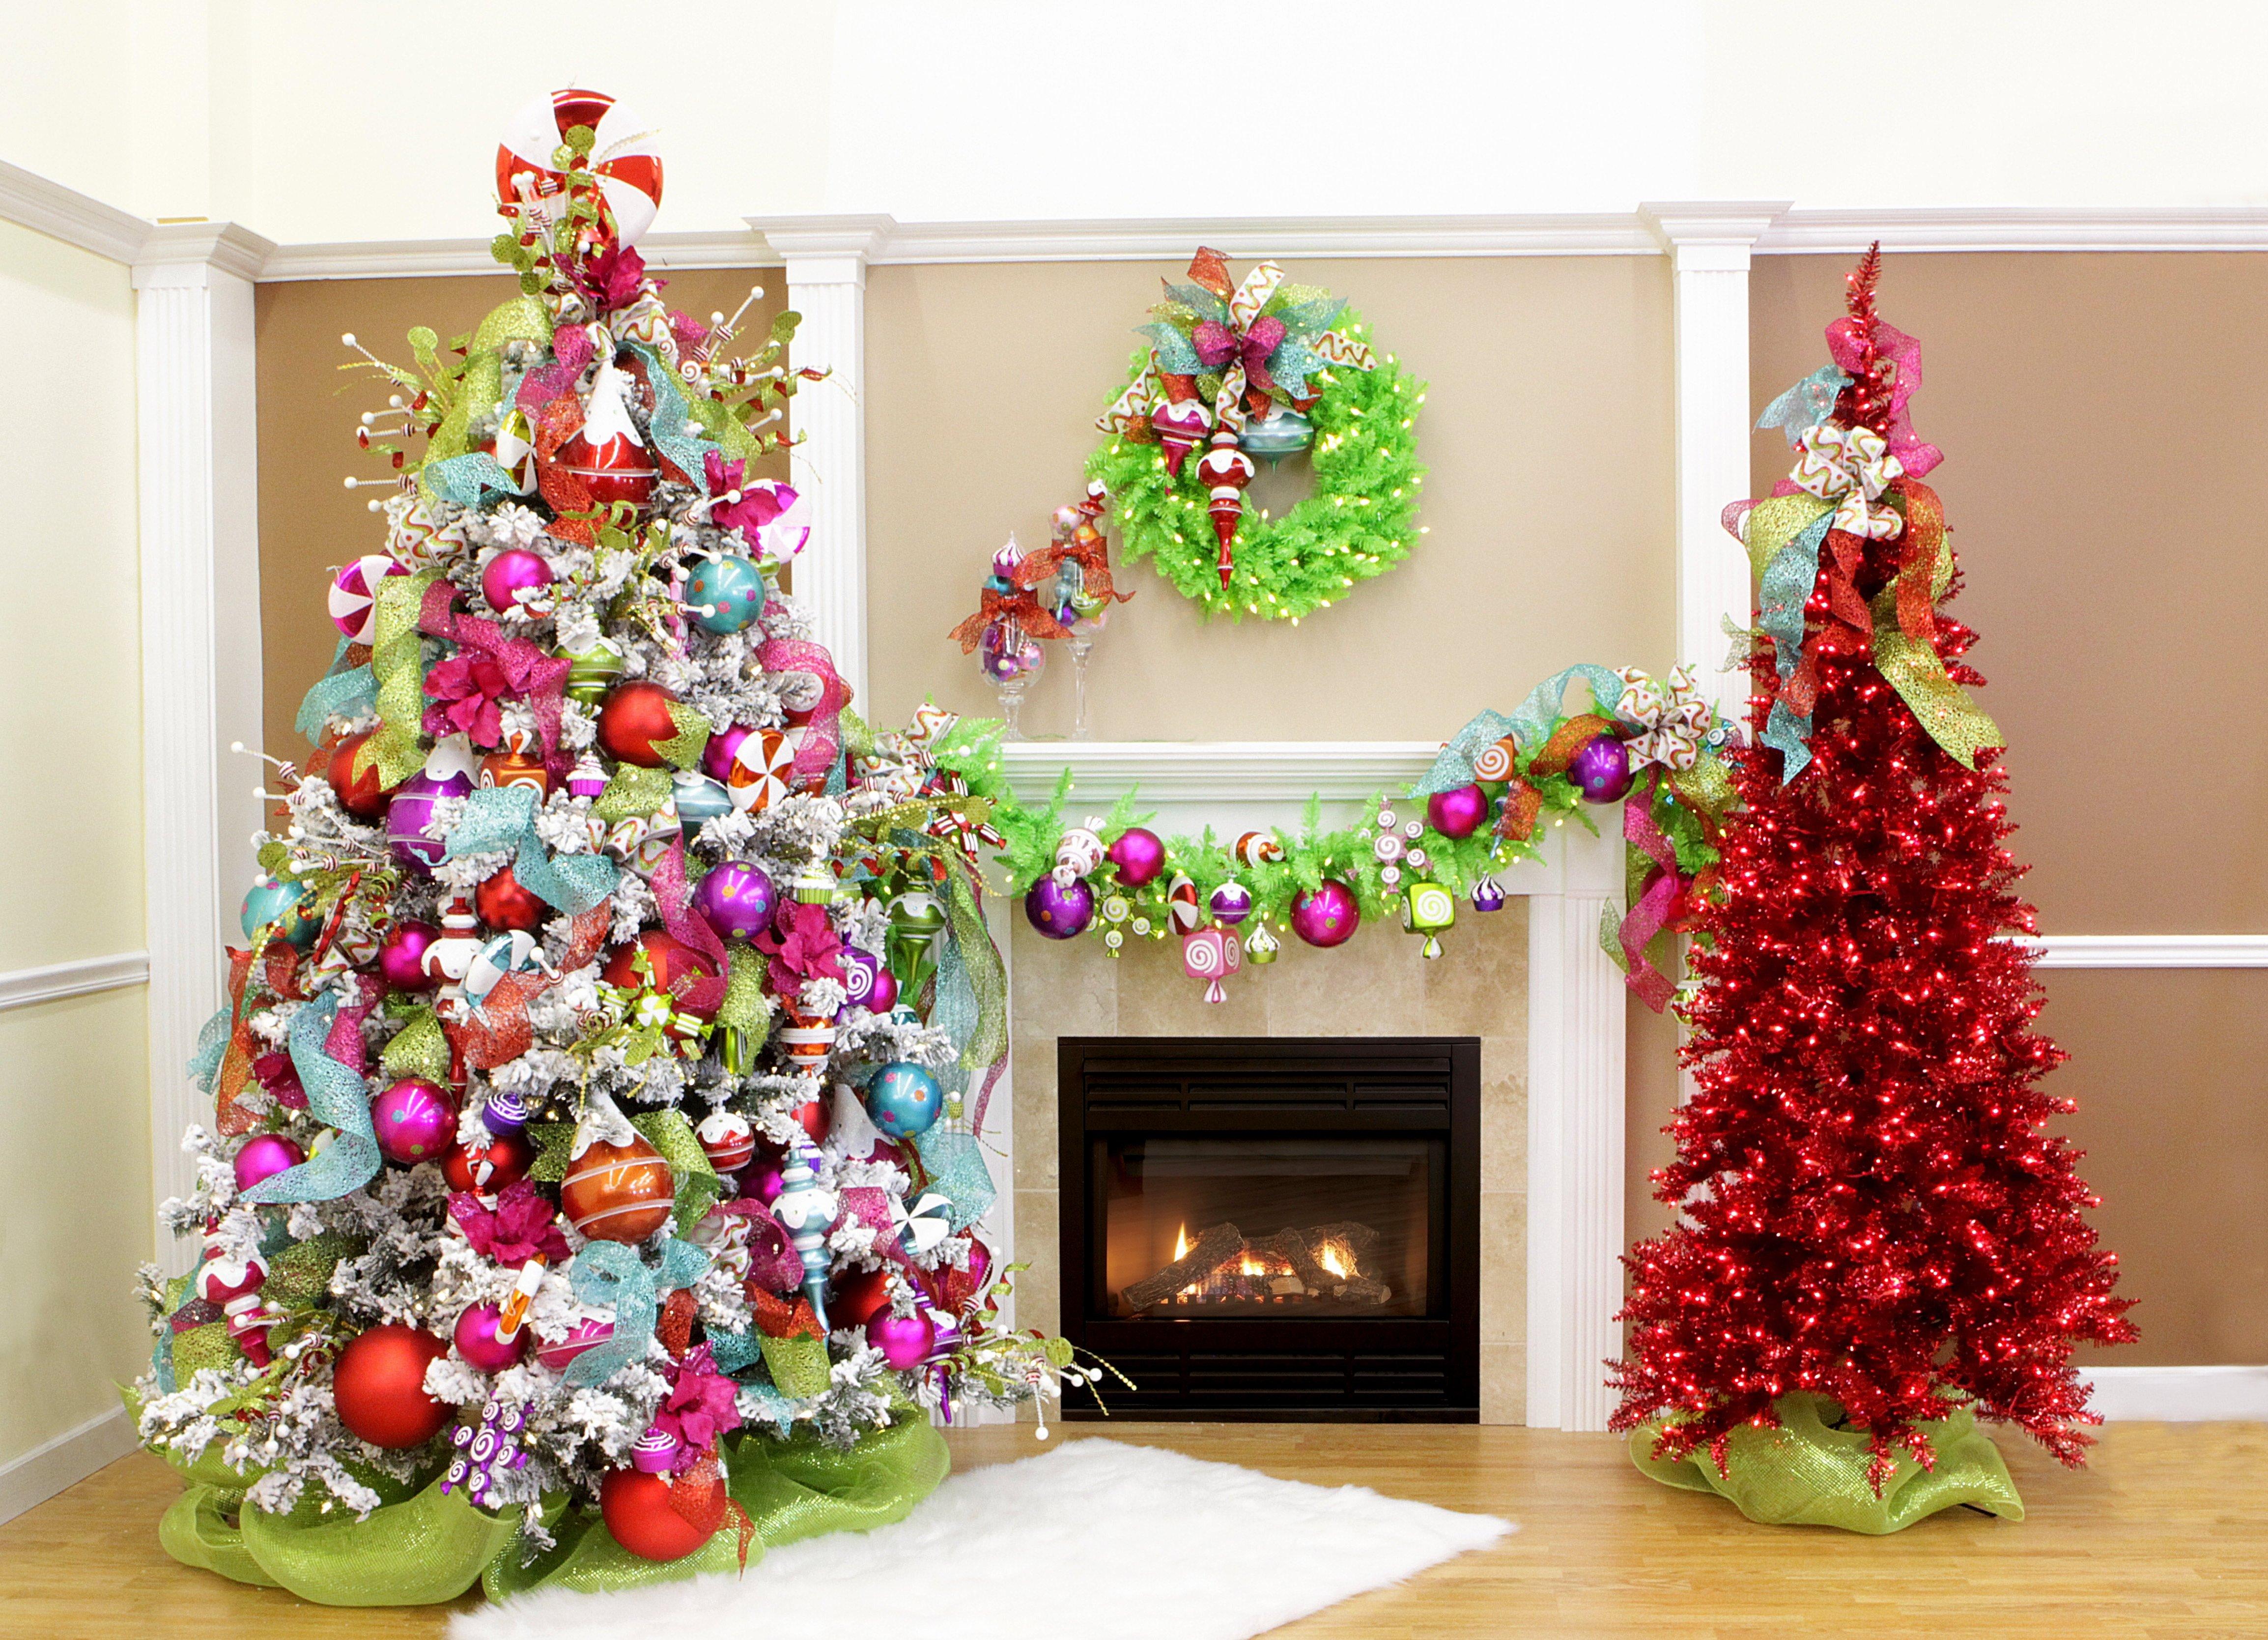 10 Pretty Unique Christmas Tree Decorating Ideas 24 cool christmas tree decorating ideas dma homes 30386